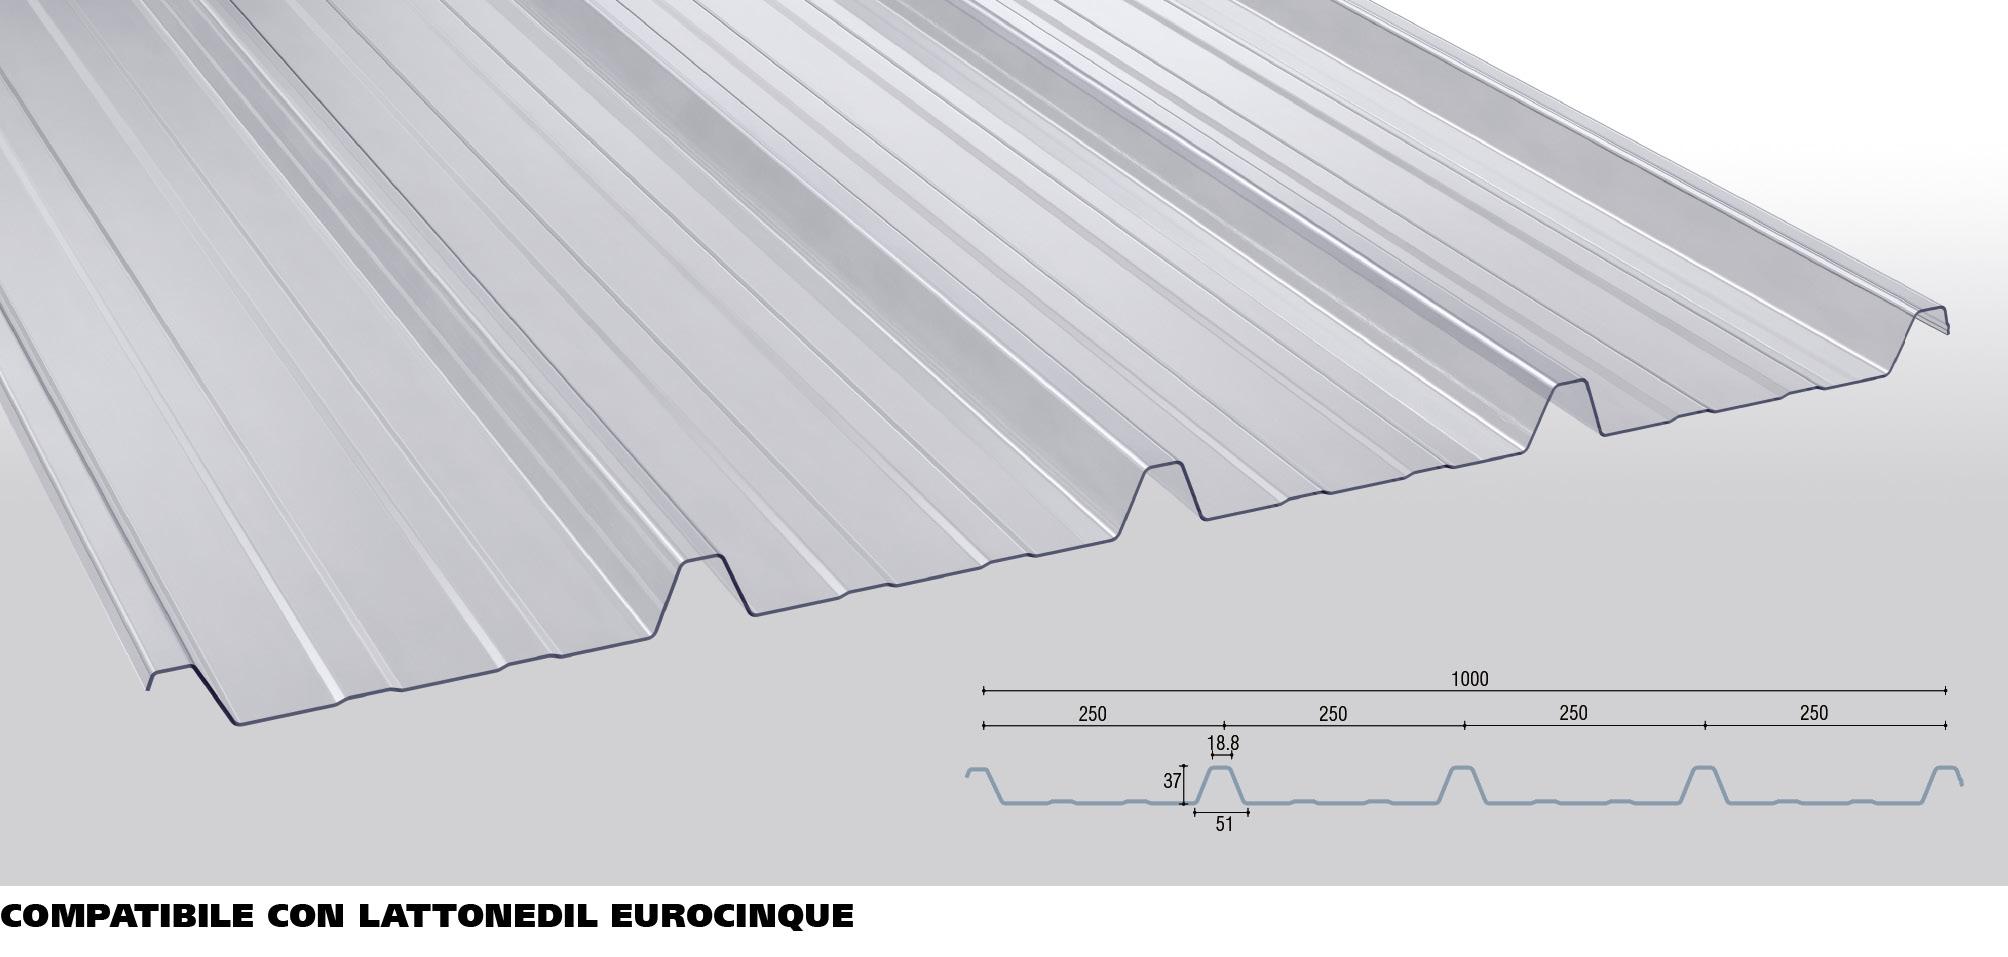 ALVEcomp - eurocinque